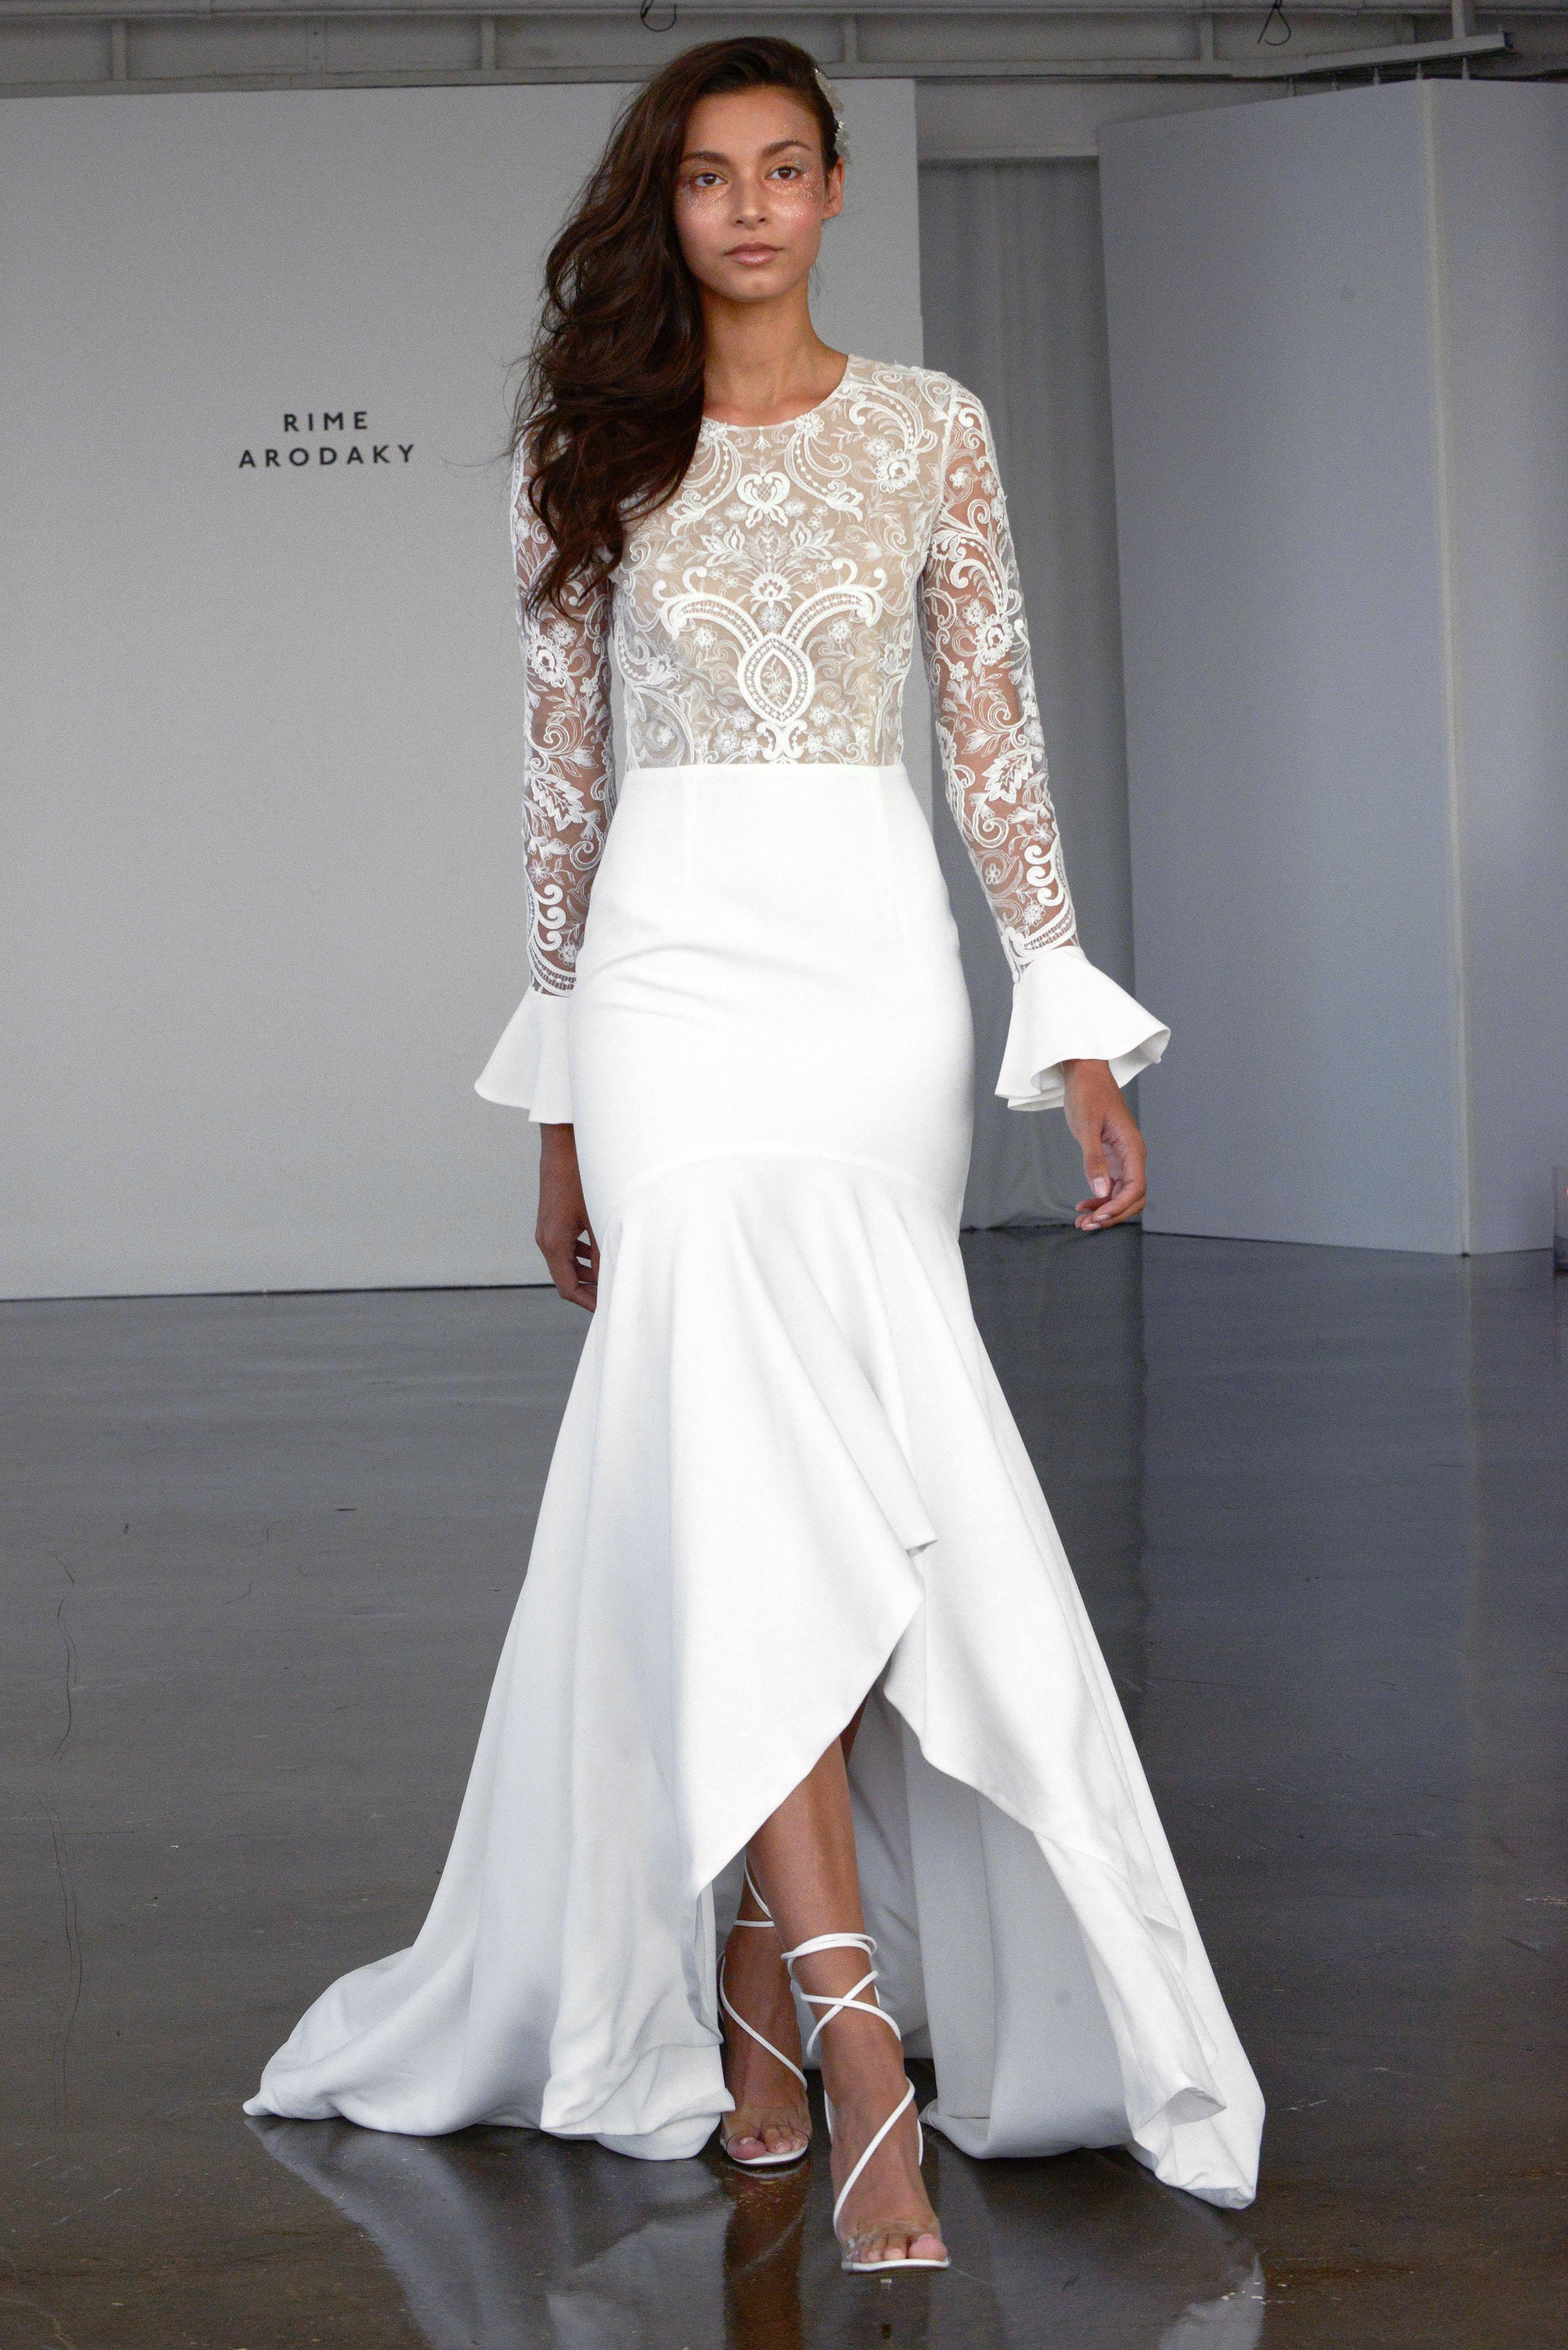 Rime Arodaky wedding dress - 4 Fall 2017